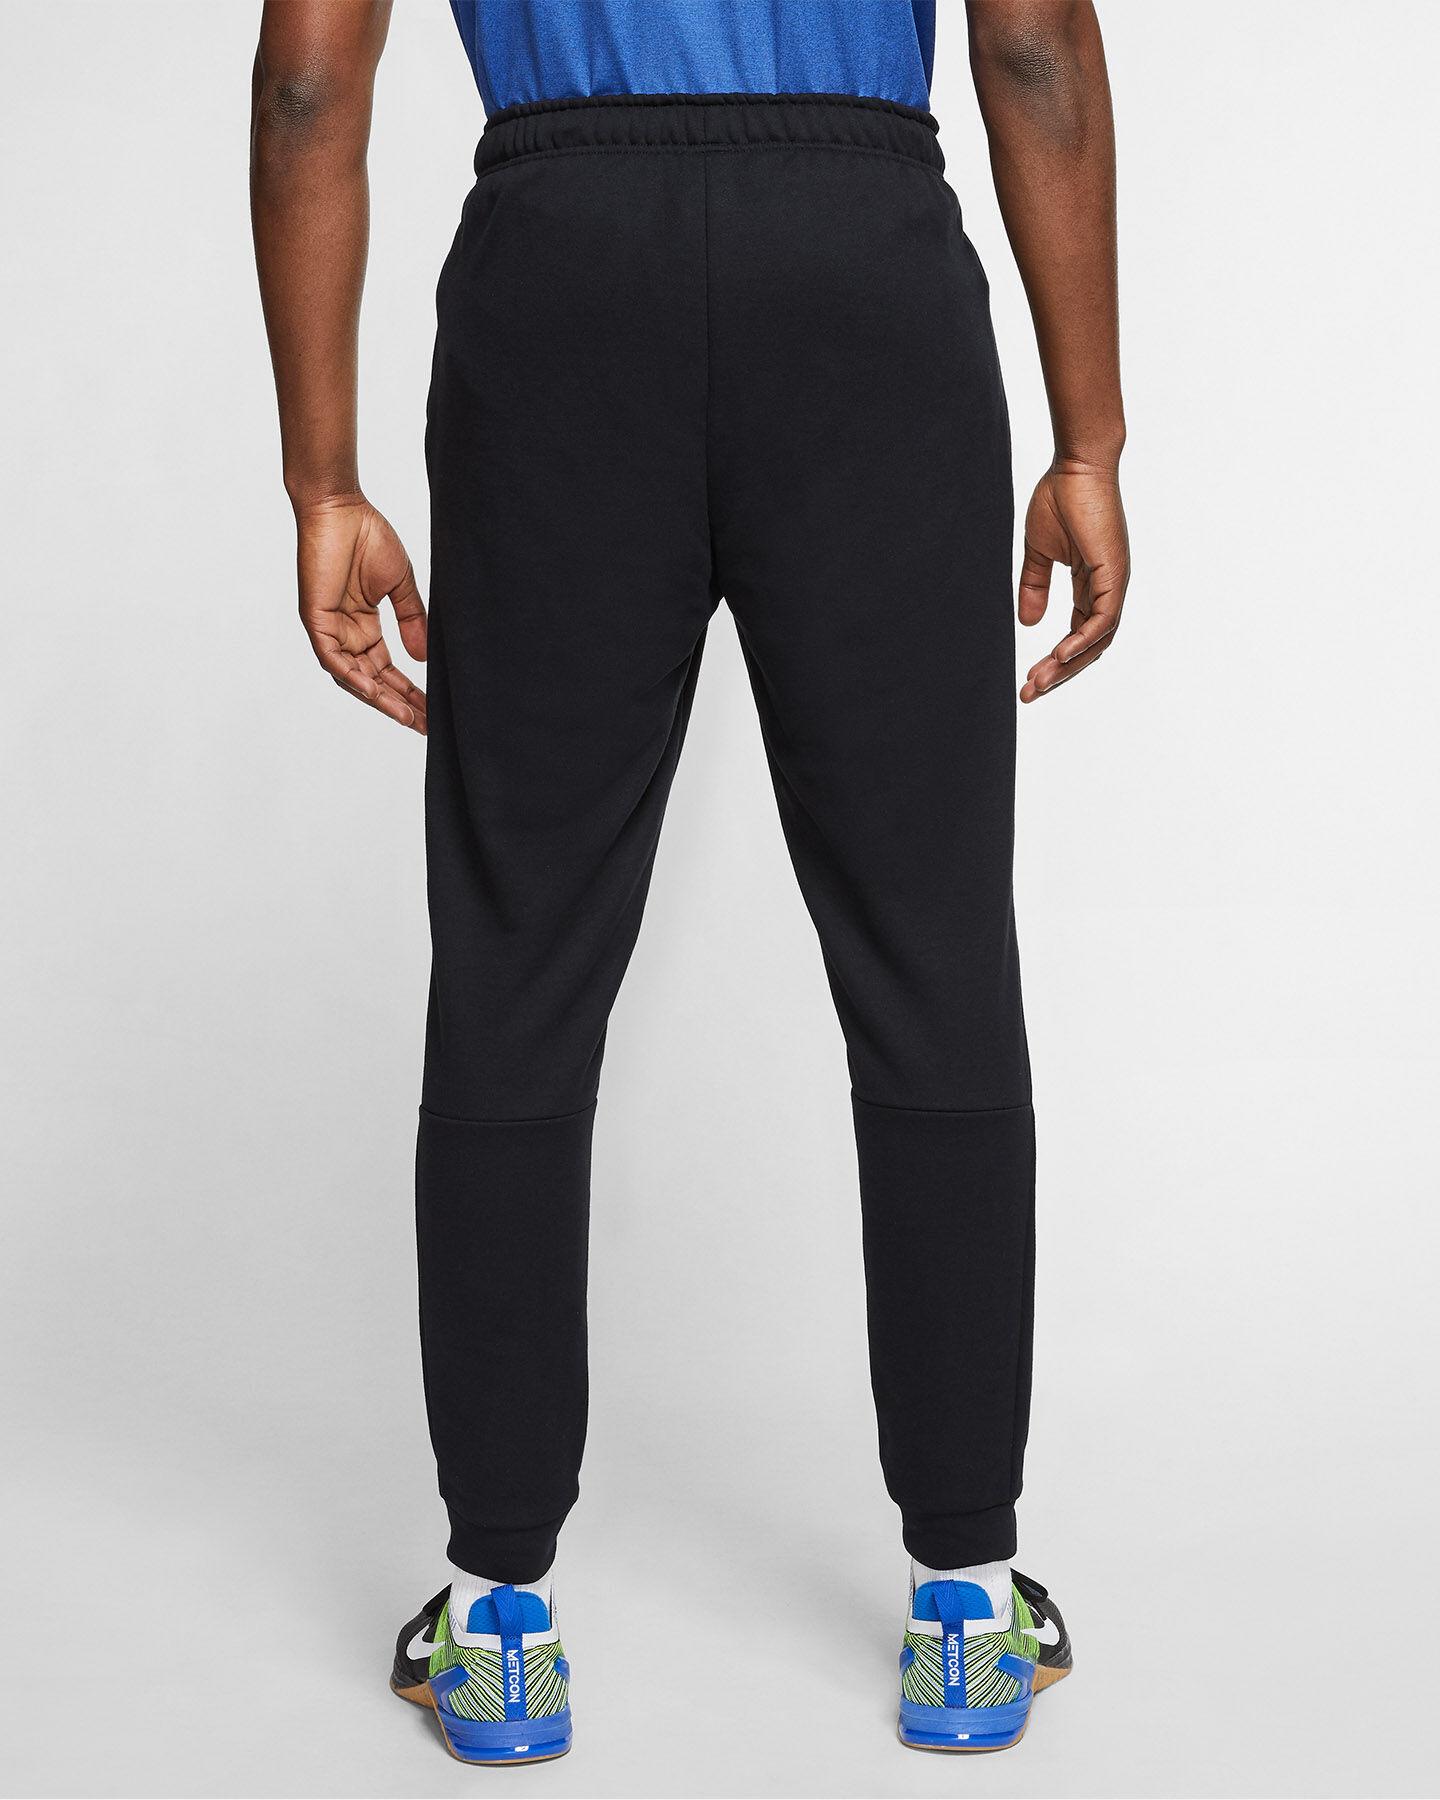 Pantalone training NIKE DRI-FIT TAPER M S5164230 scatto 4